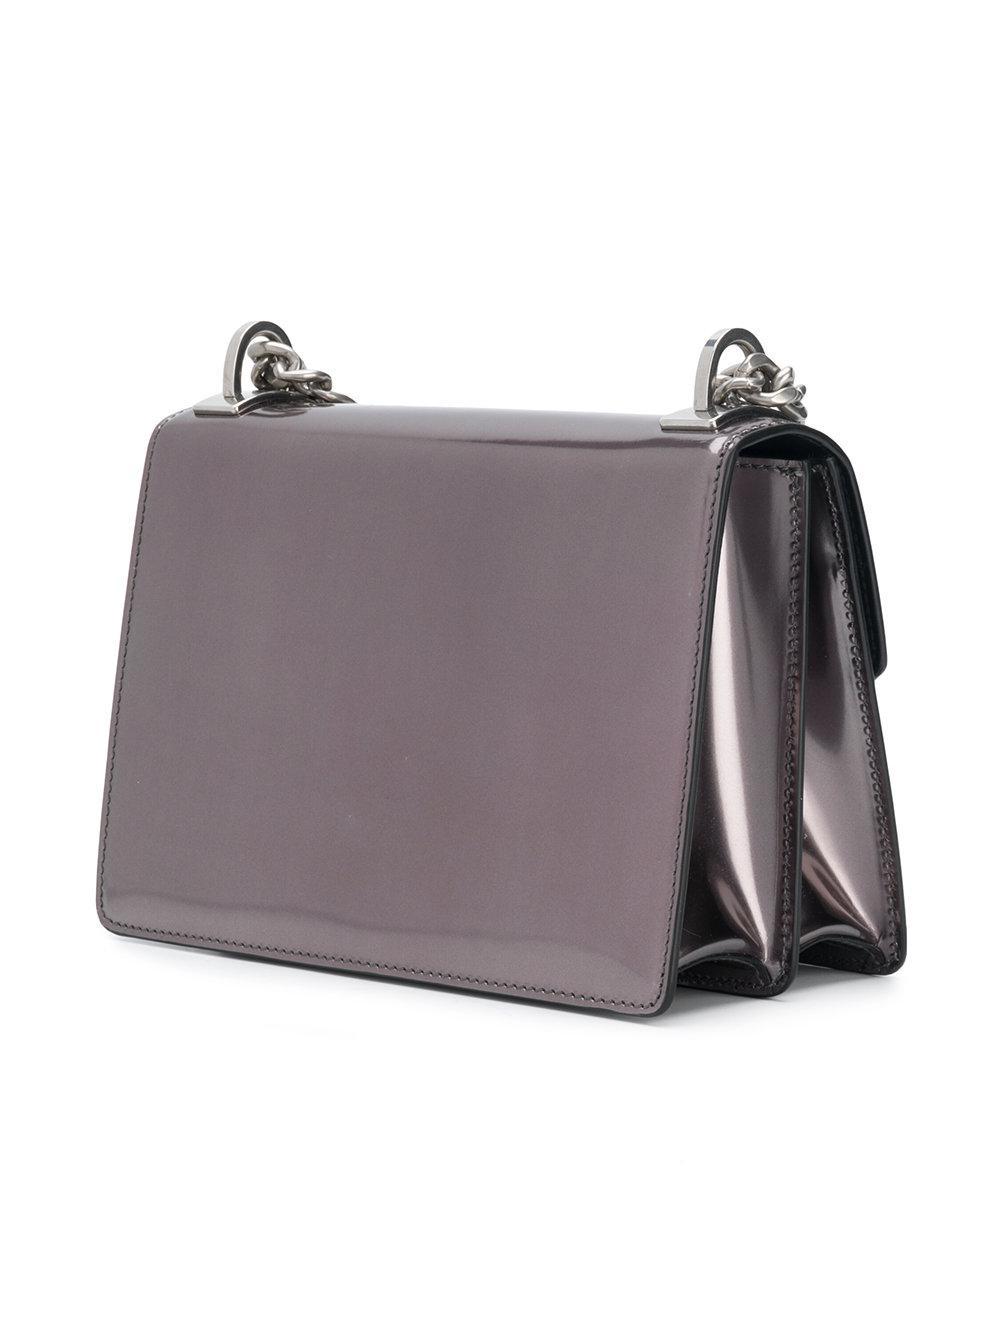 Prada Leather Logo Plaque Crossbody Bag in Metallic